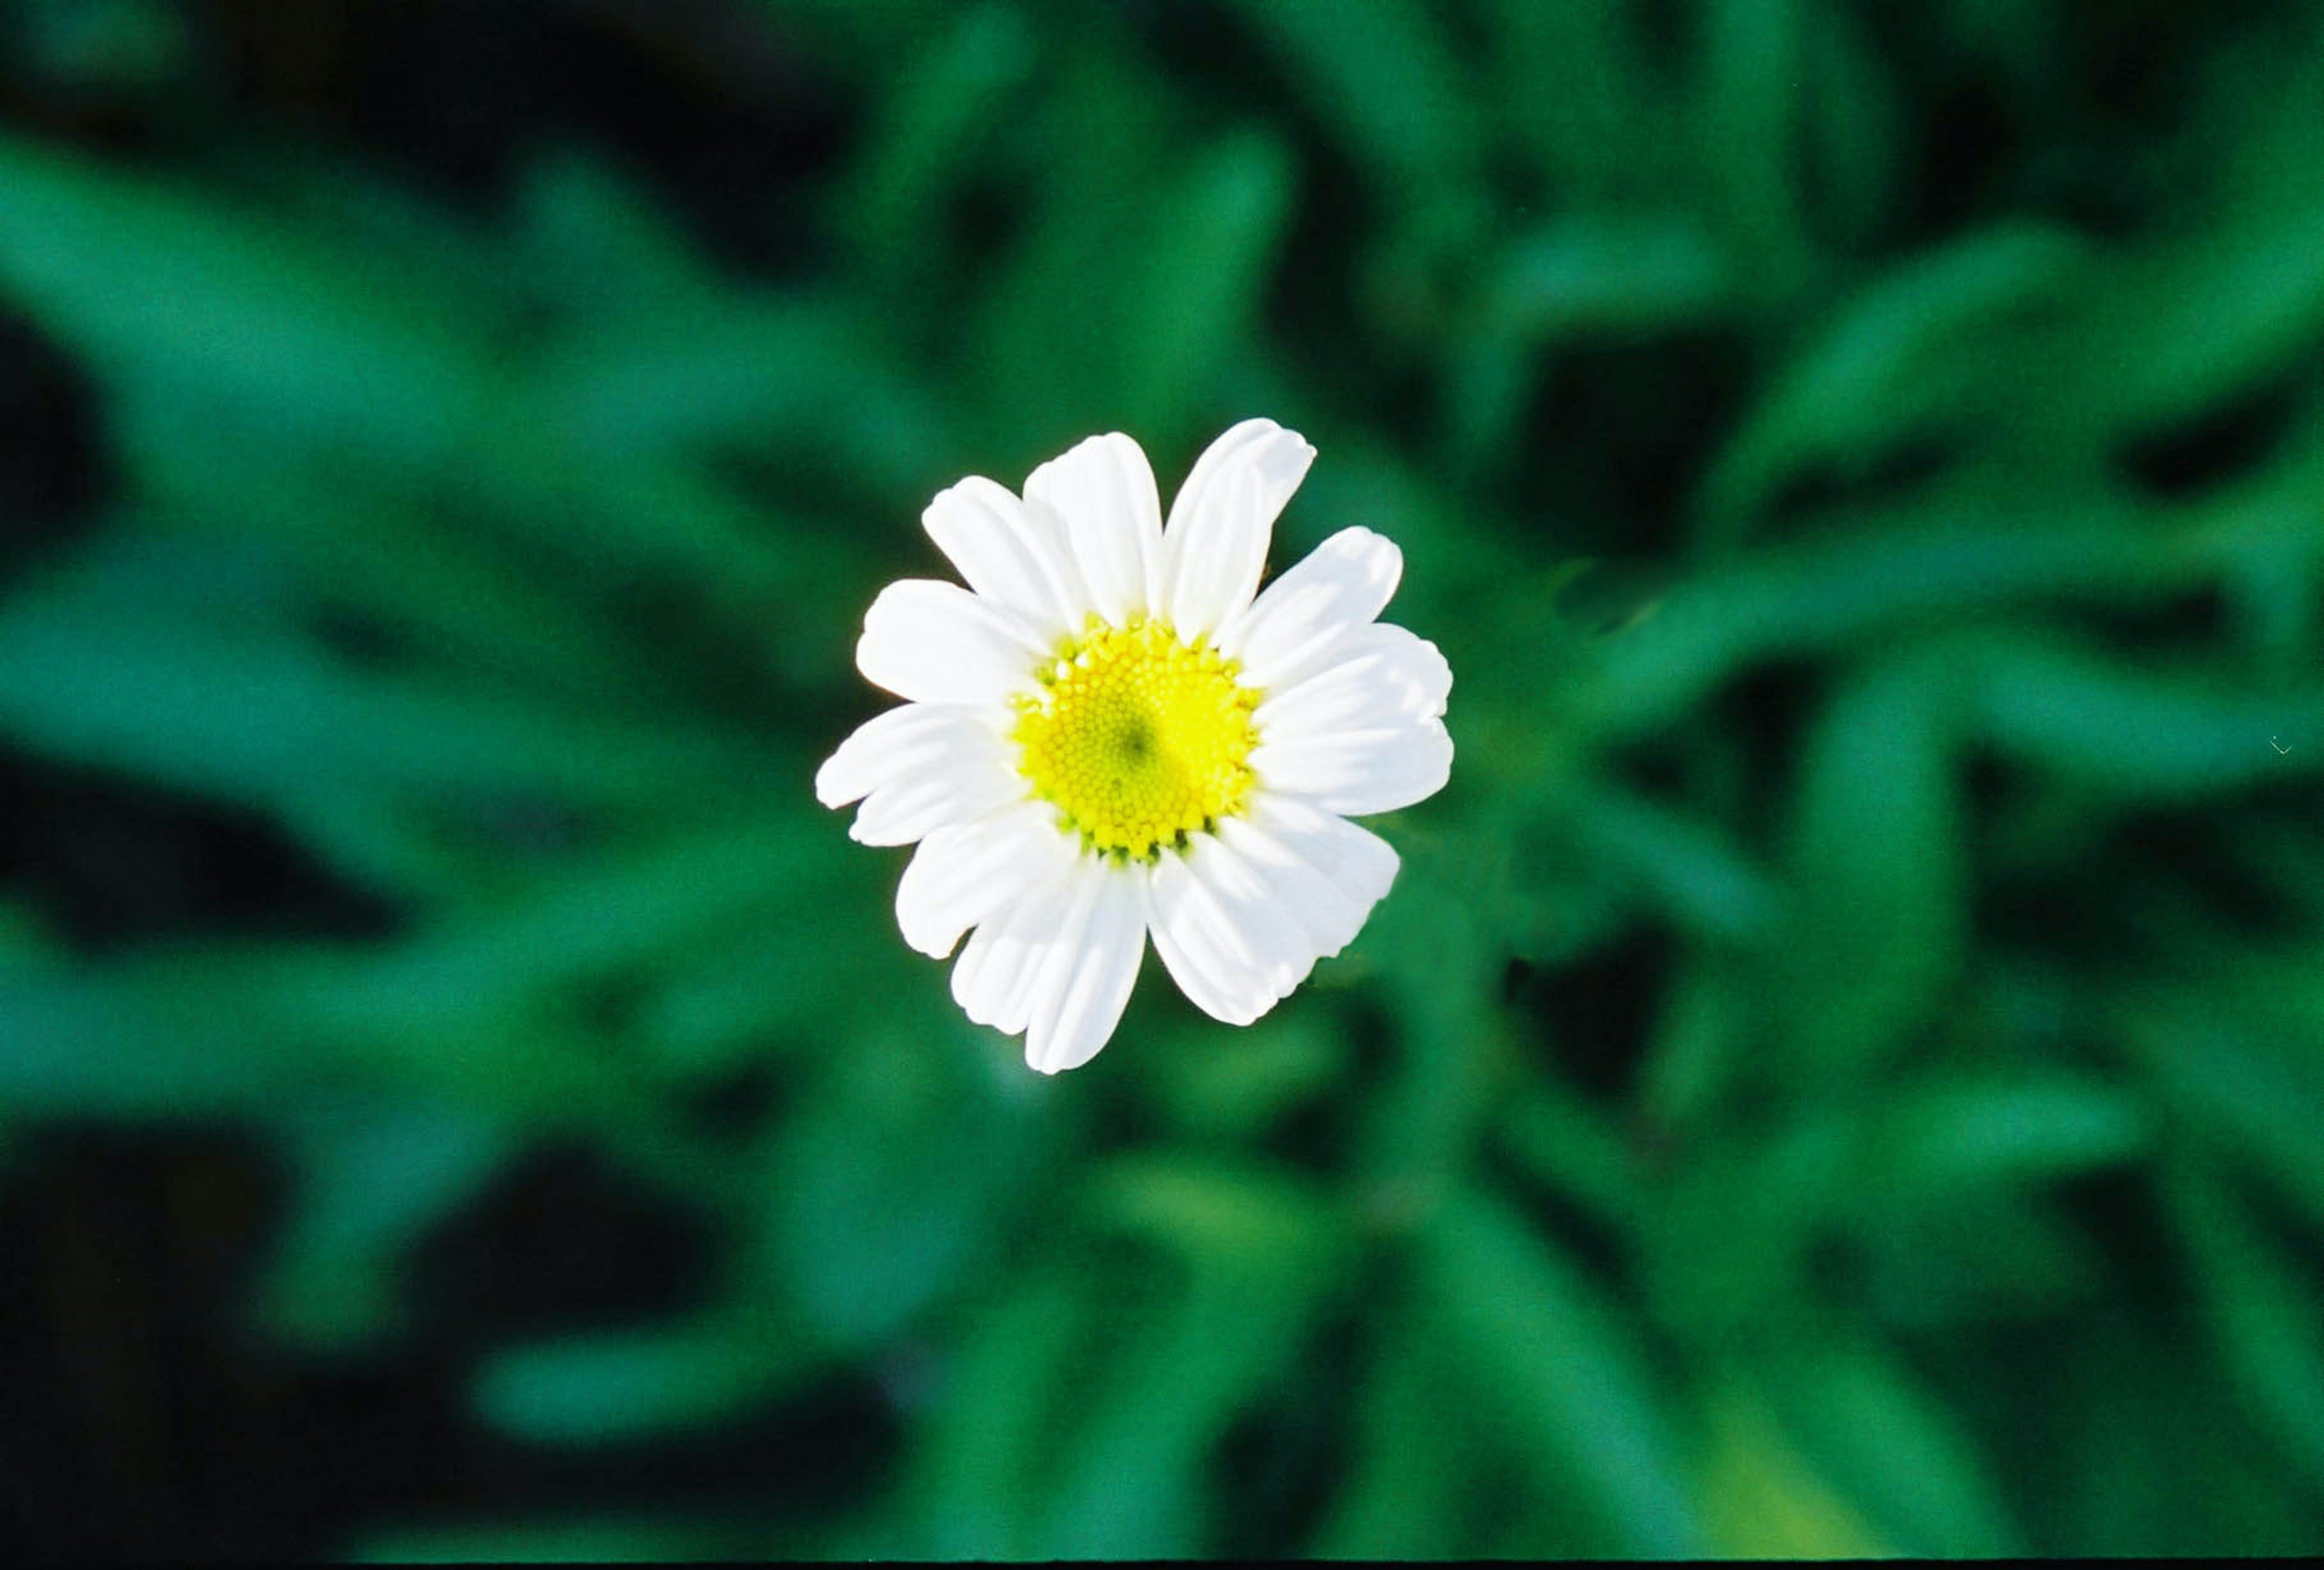 Free stock photo of daisy, white flower